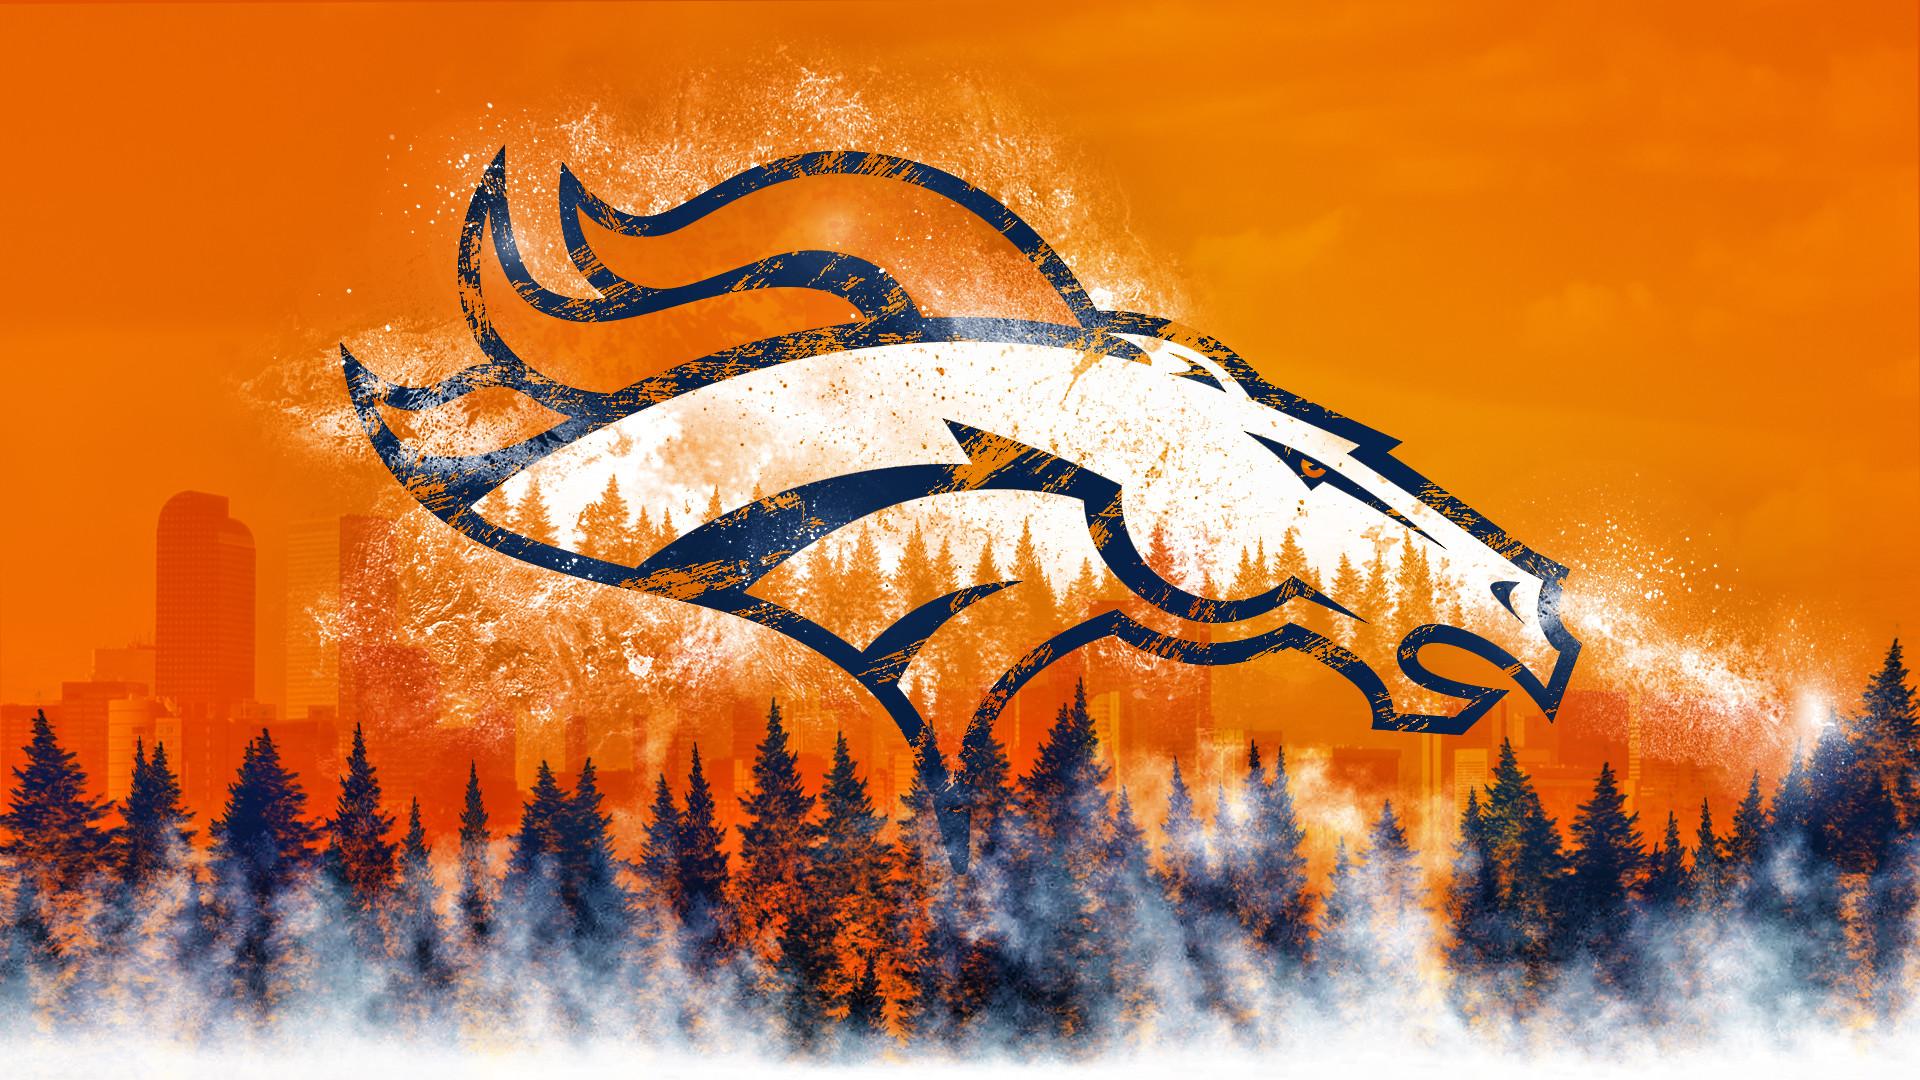 Denver Broncos Vs Carolina Panthers 2016 Super Bowl 50 Wallpapers |  Adorable Wallpapers | Pinterest | Wallpaper